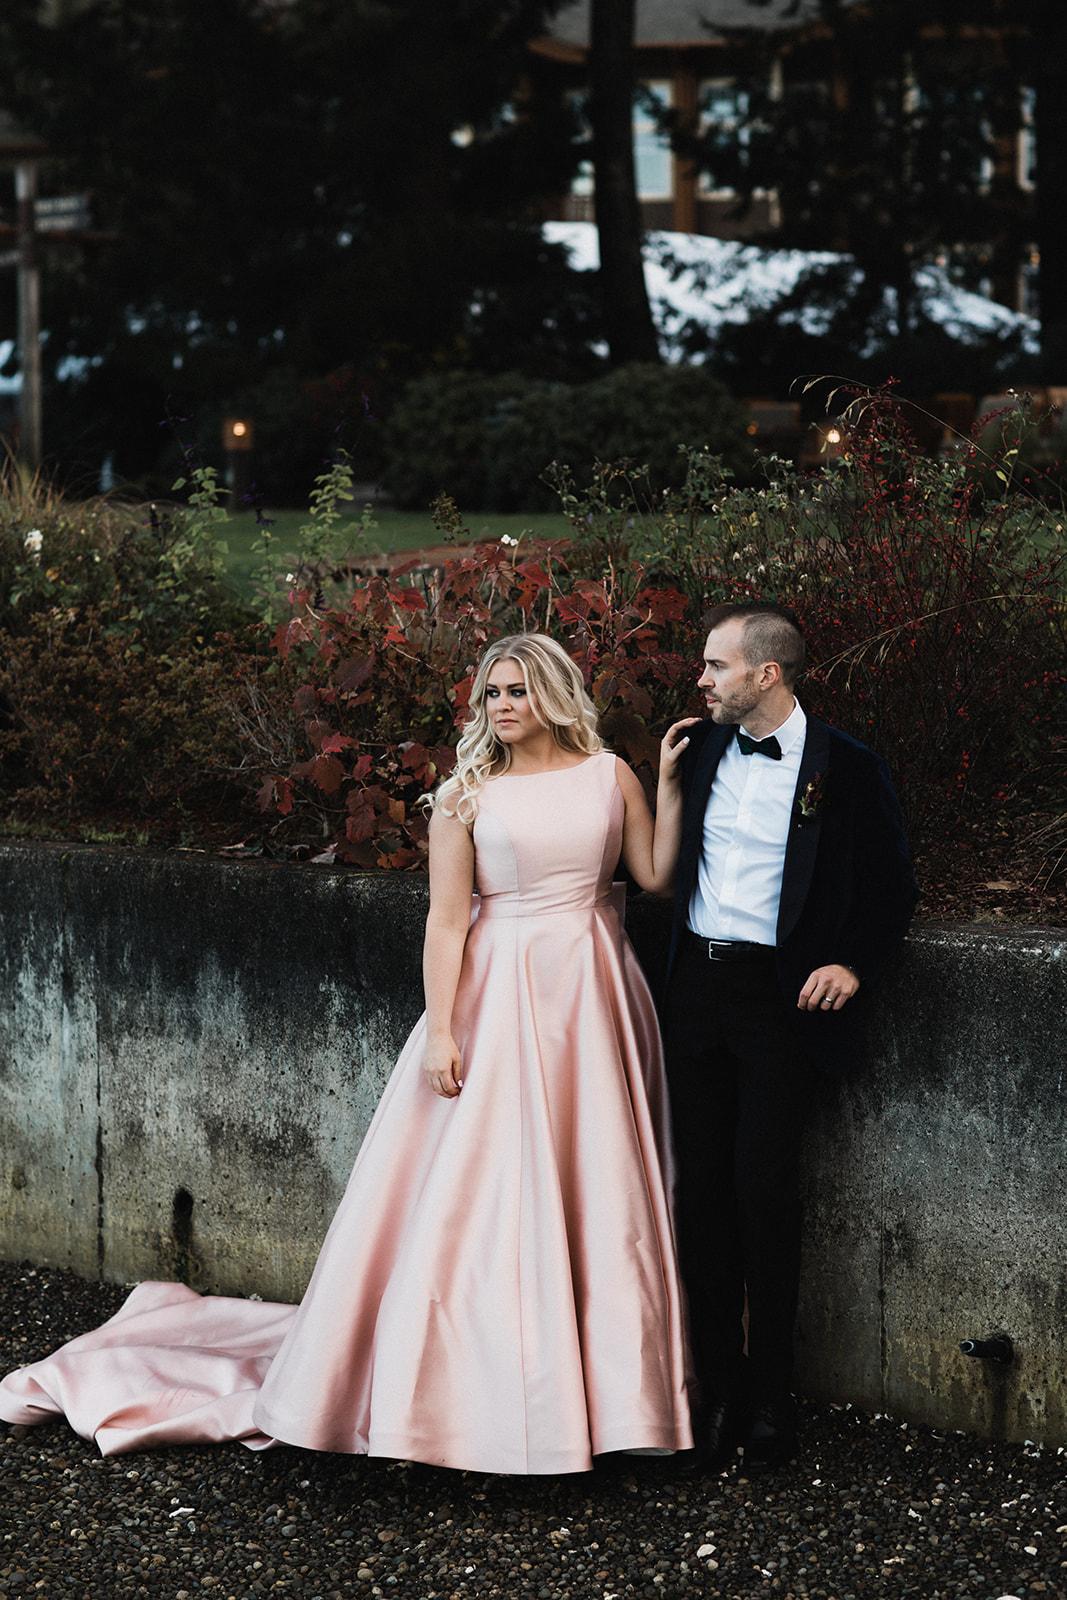 Bridalbliss.com | Seattle Wedding | Washington Event Coordination and Design | Sullivan & Sullivan